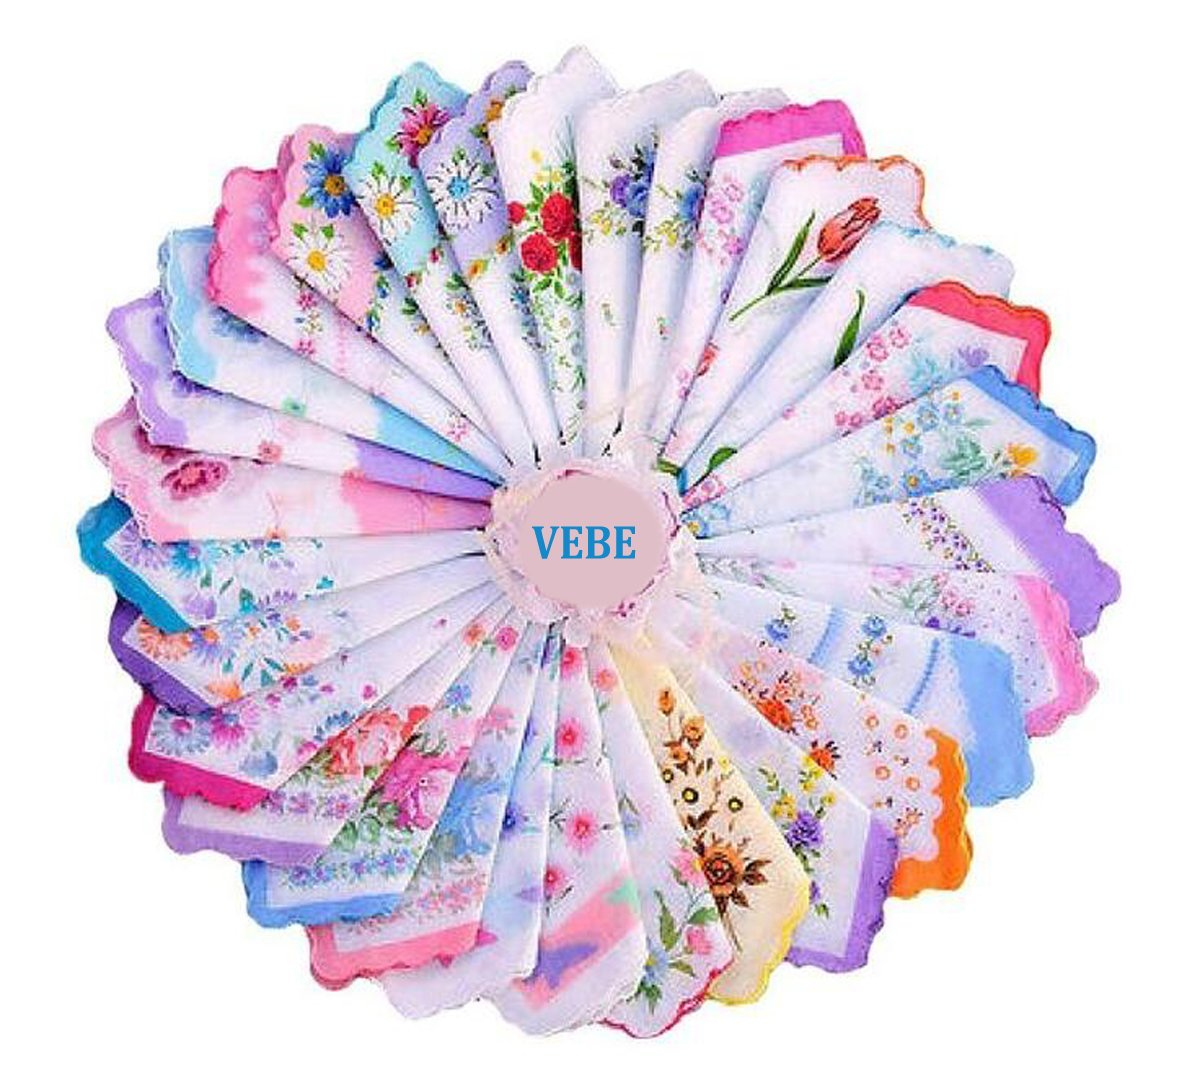 VEBE Womens/Girls Vintage Floral Wedding Party Cotton Handkerchiefs 0